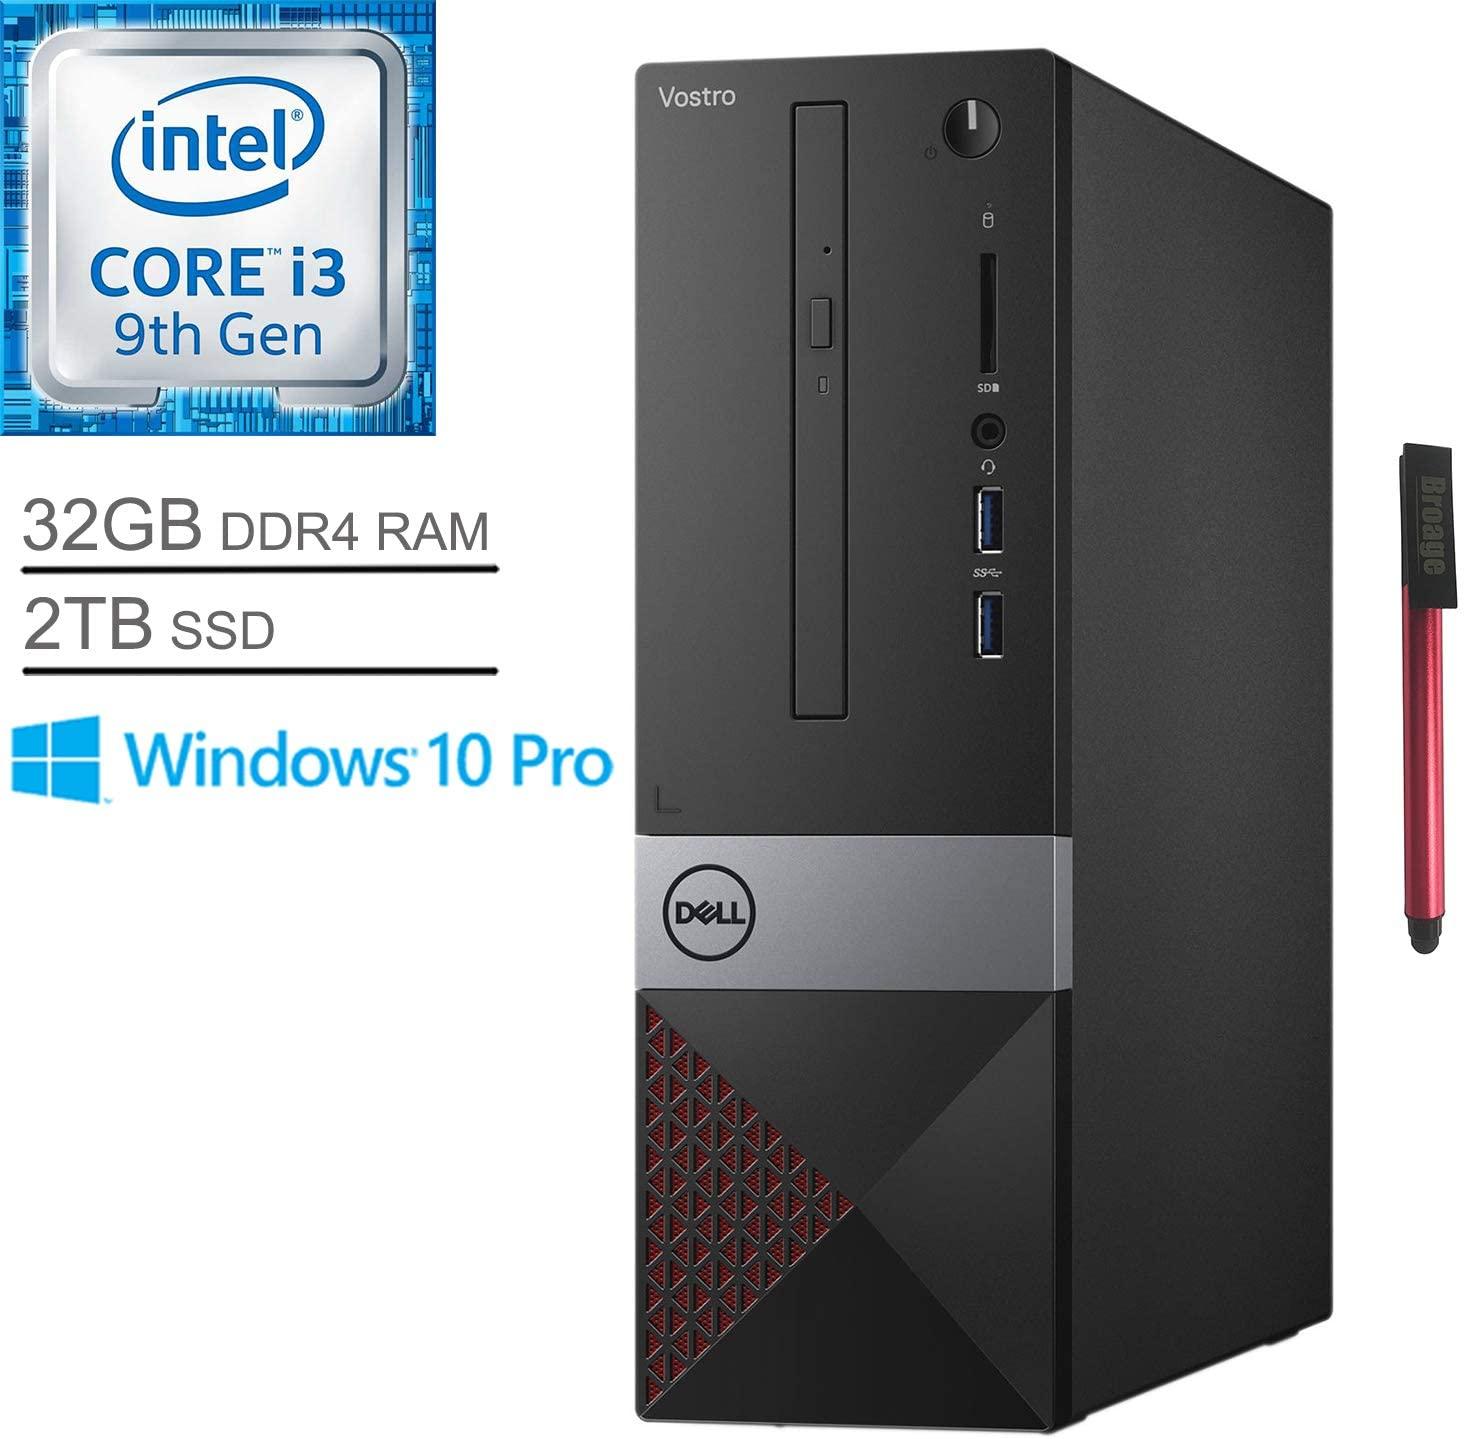 Dell Vostro 3471 Business Small Desktop Computer, Intel Quad-Core i3 9100 Up to 4.2GHz (Beats i5-7400), 32GB DDR4 RAM, 2TB SSD, DVDRW, WiFi, Bluetooth, HDMI, Windows 10 Pro, BROAGE 64GB Flash Stylus